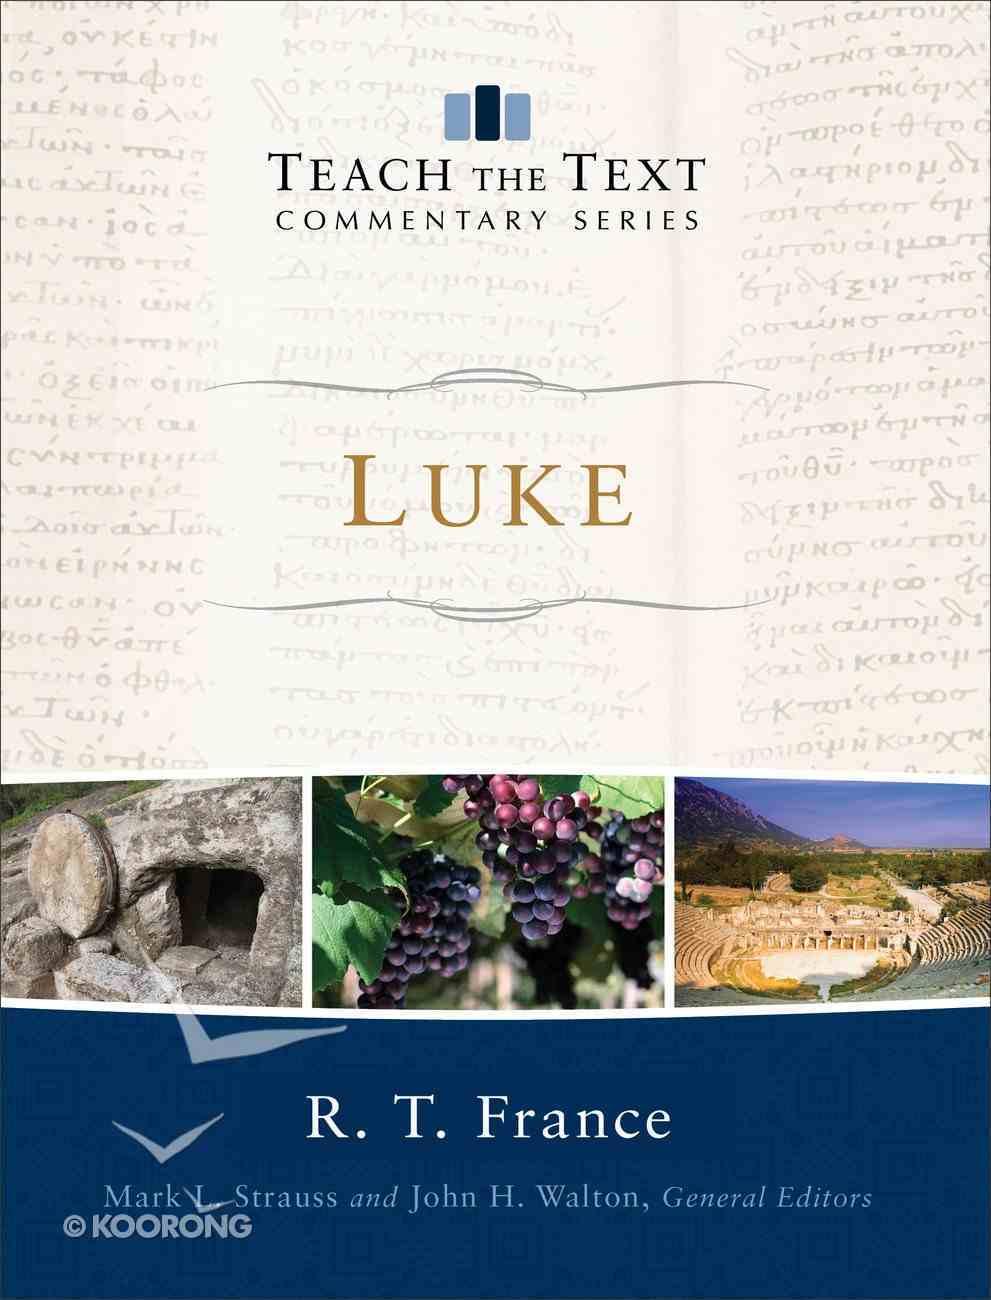 Luke (Teach The Text Commentary Series) eBook